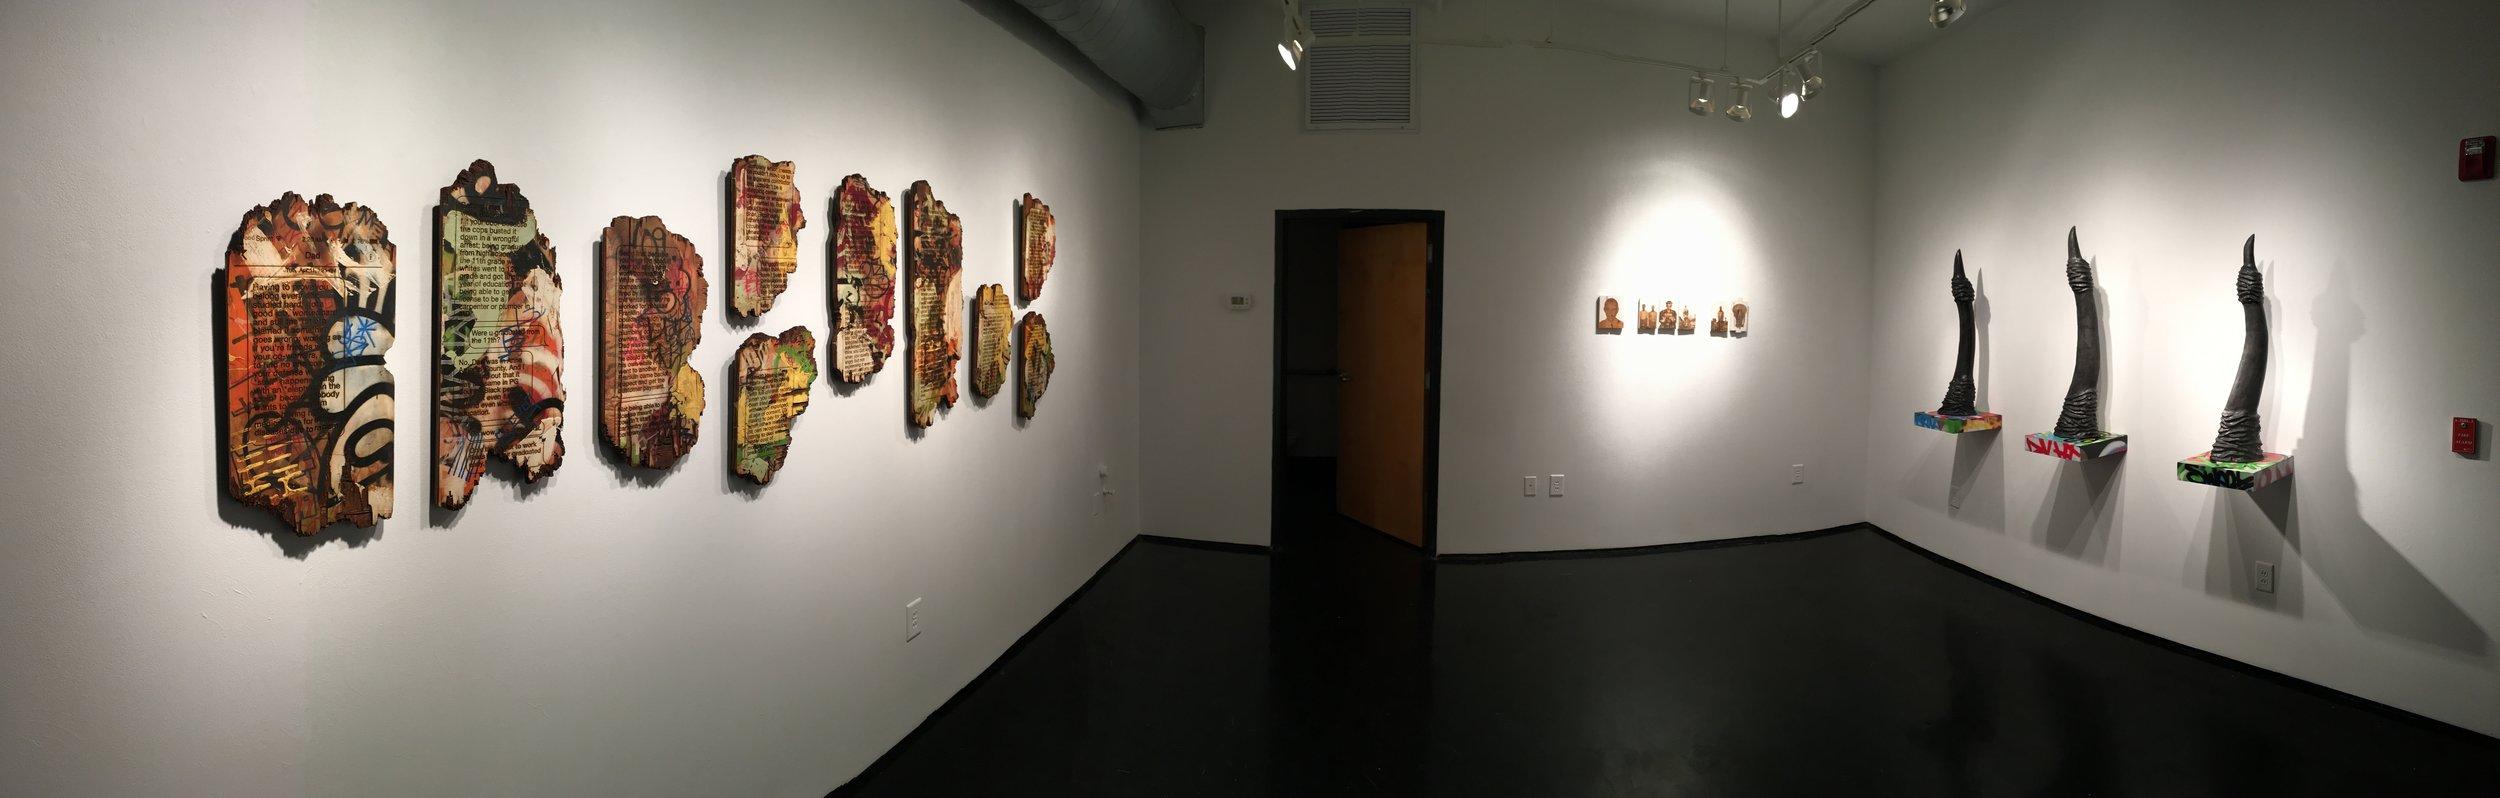 """The Prophet's Library"" @ Tinney Contemporary, Nashville,TN - 2017"